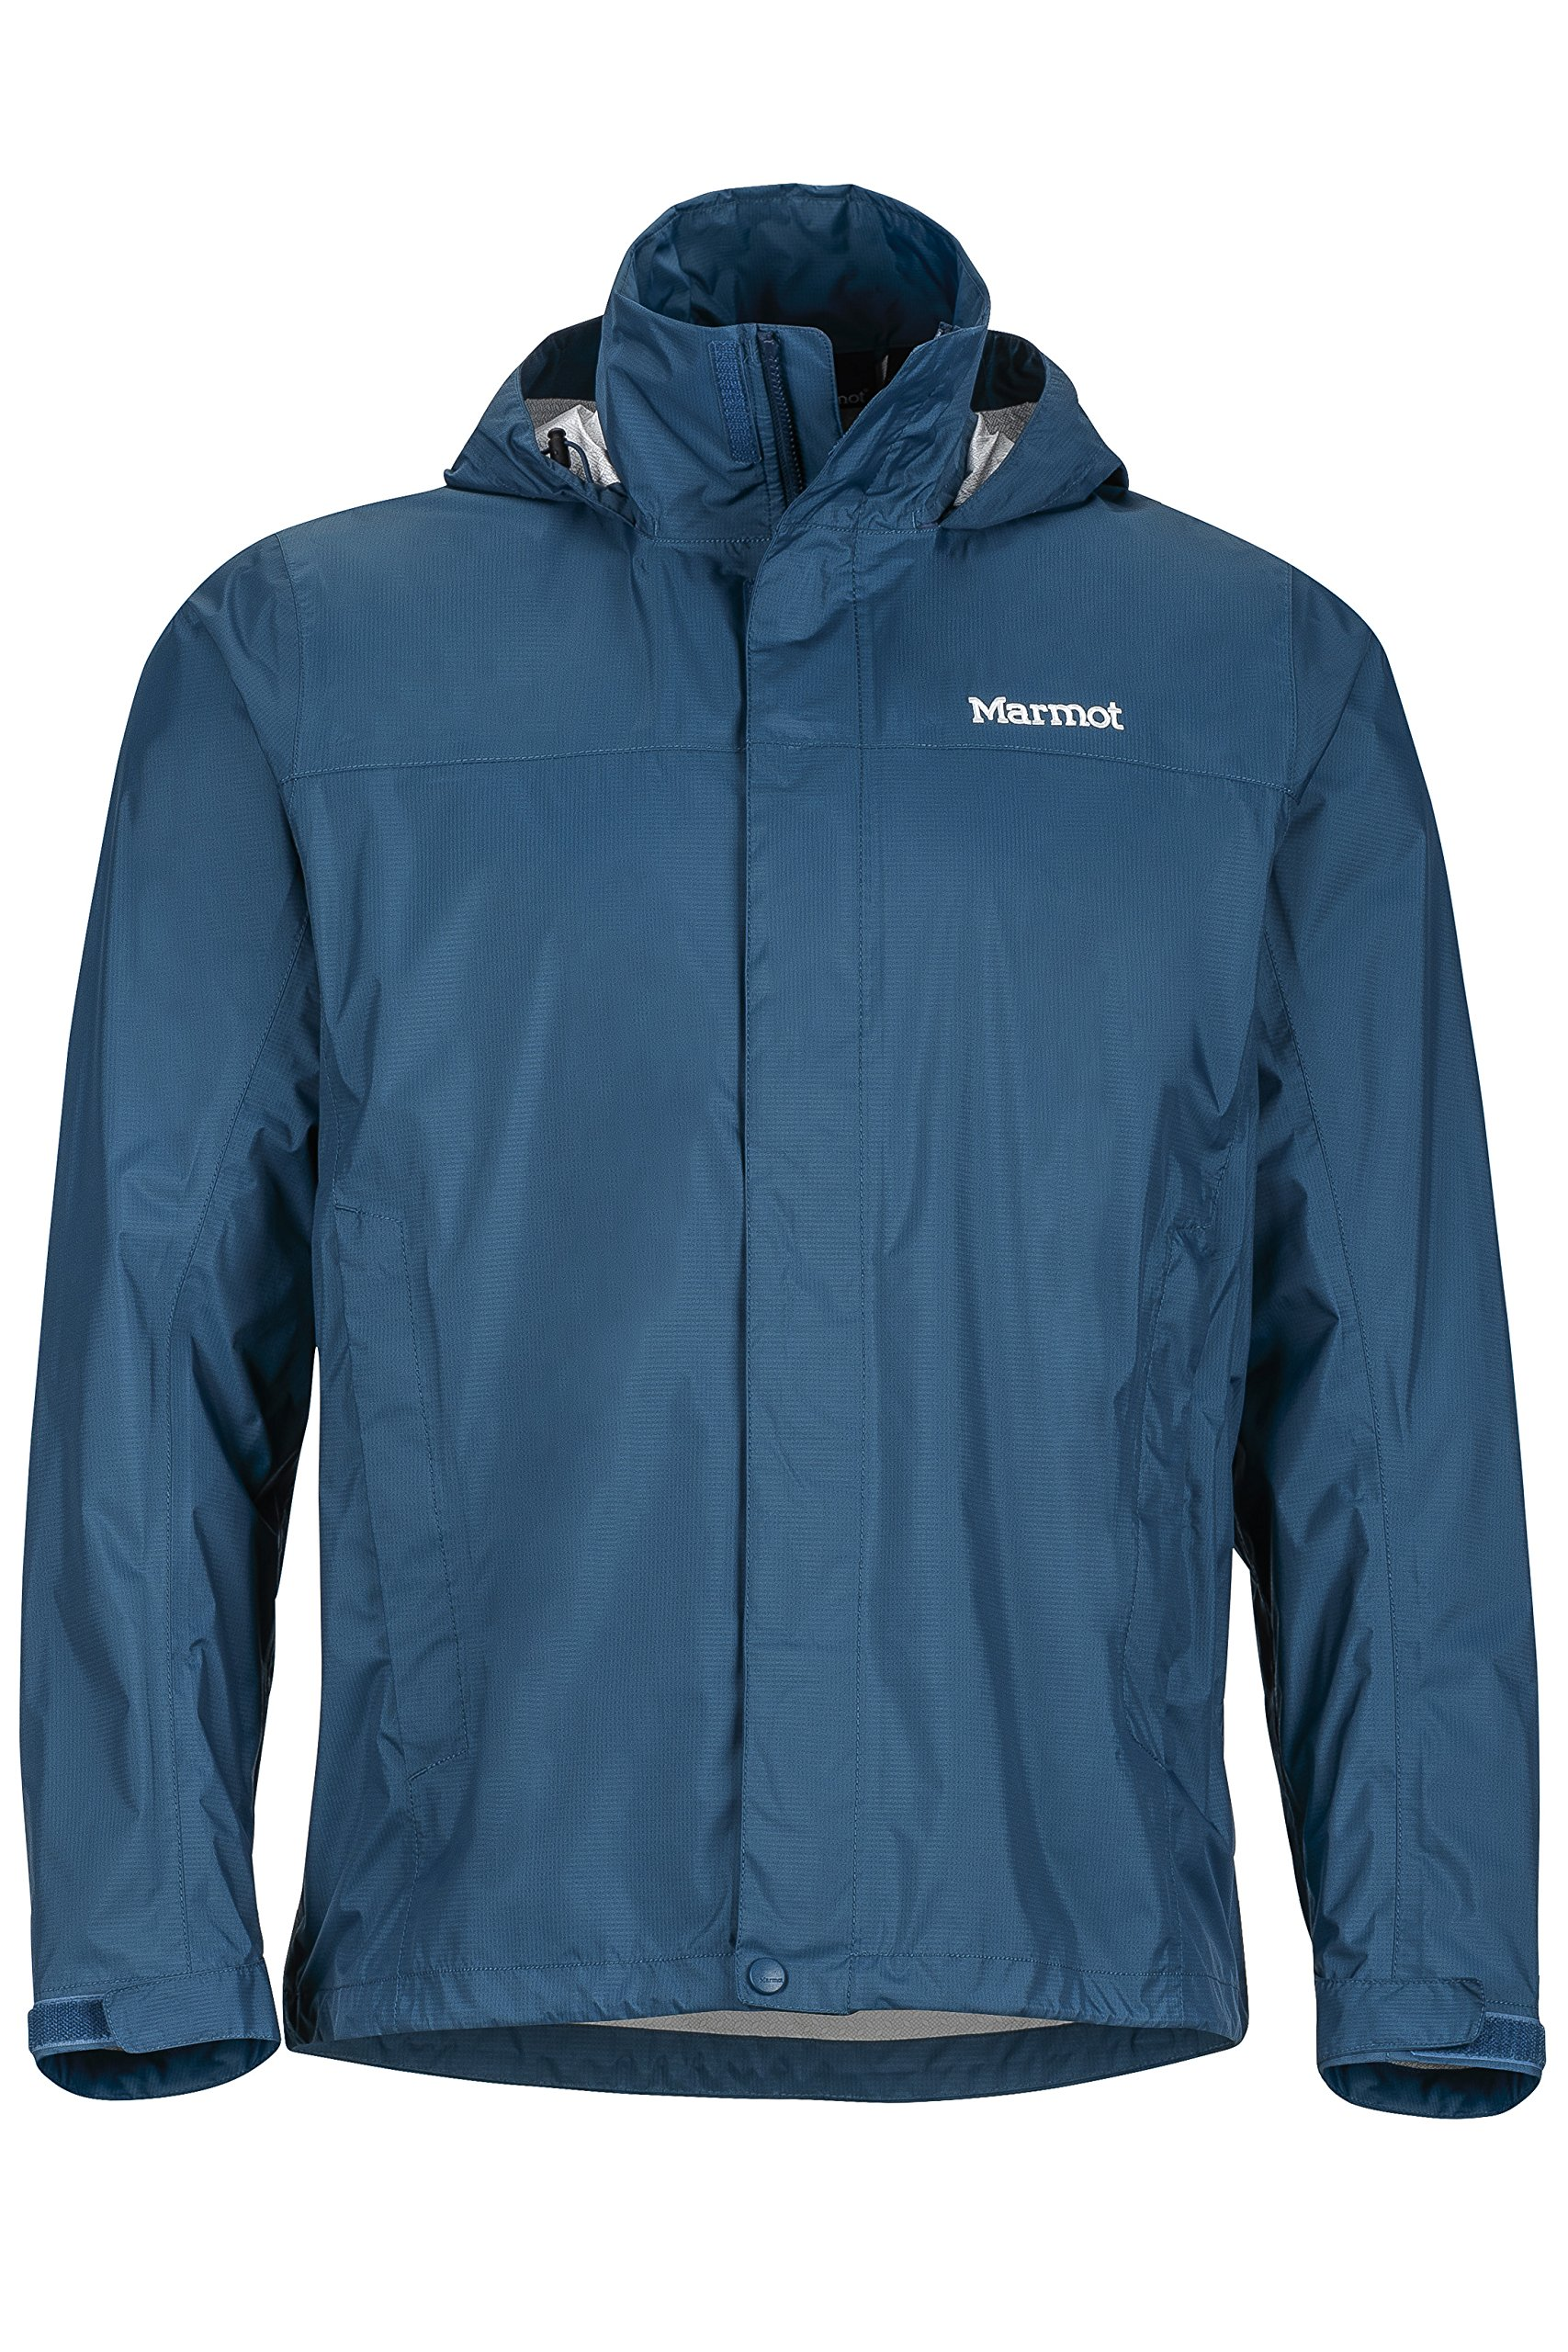 Marmot Men's Precip Jacket, Denim, Small